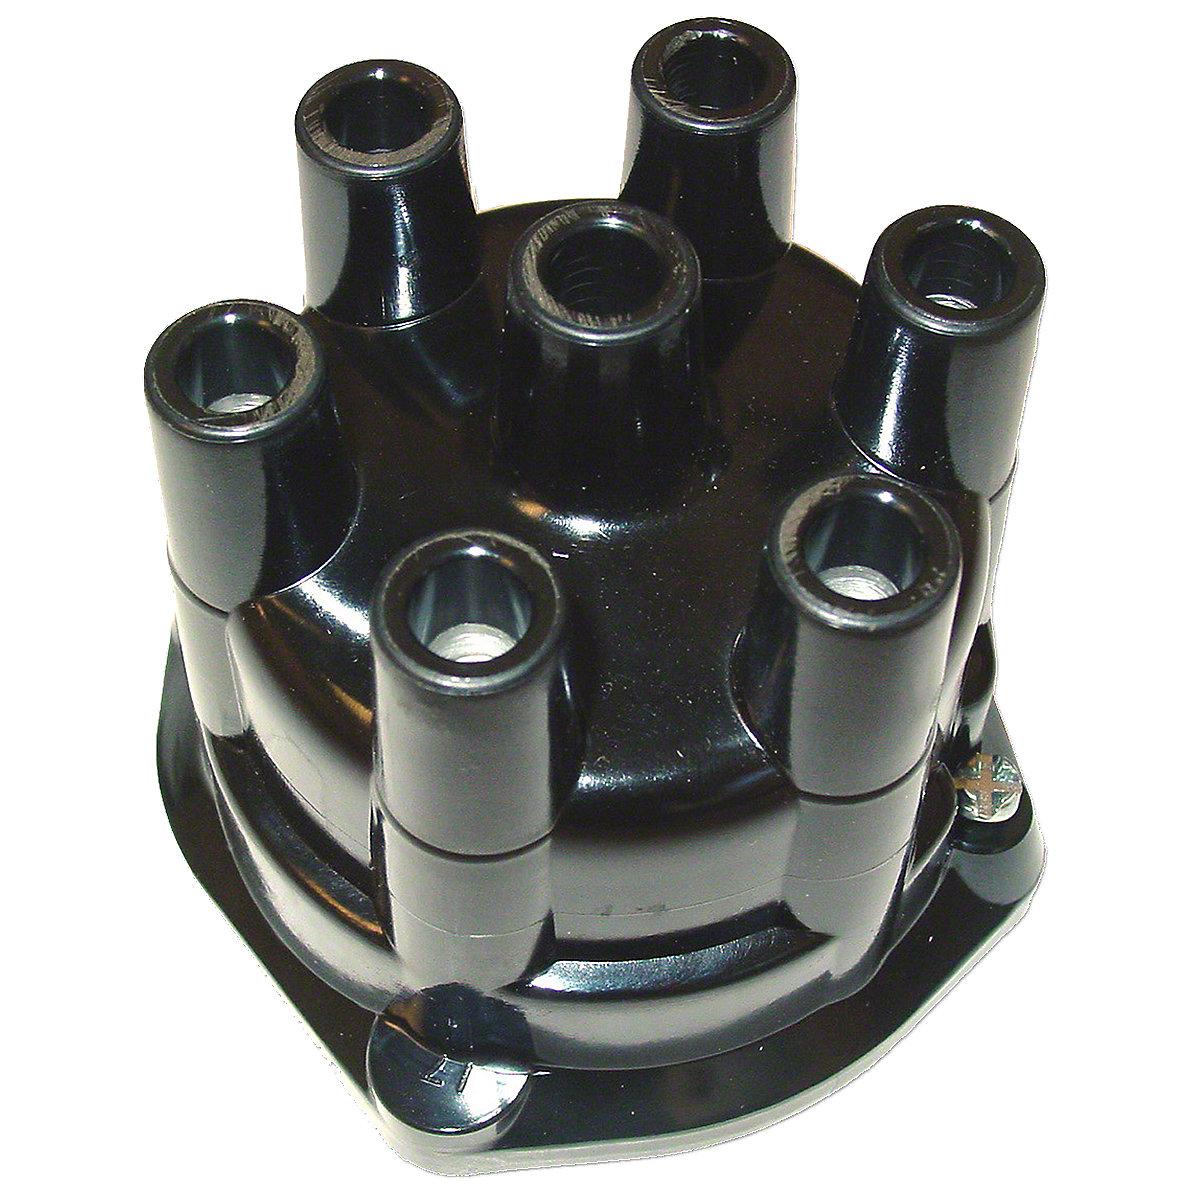 6 Cylinder Delco Distributor Cap For Massey Ferguson: 1100.